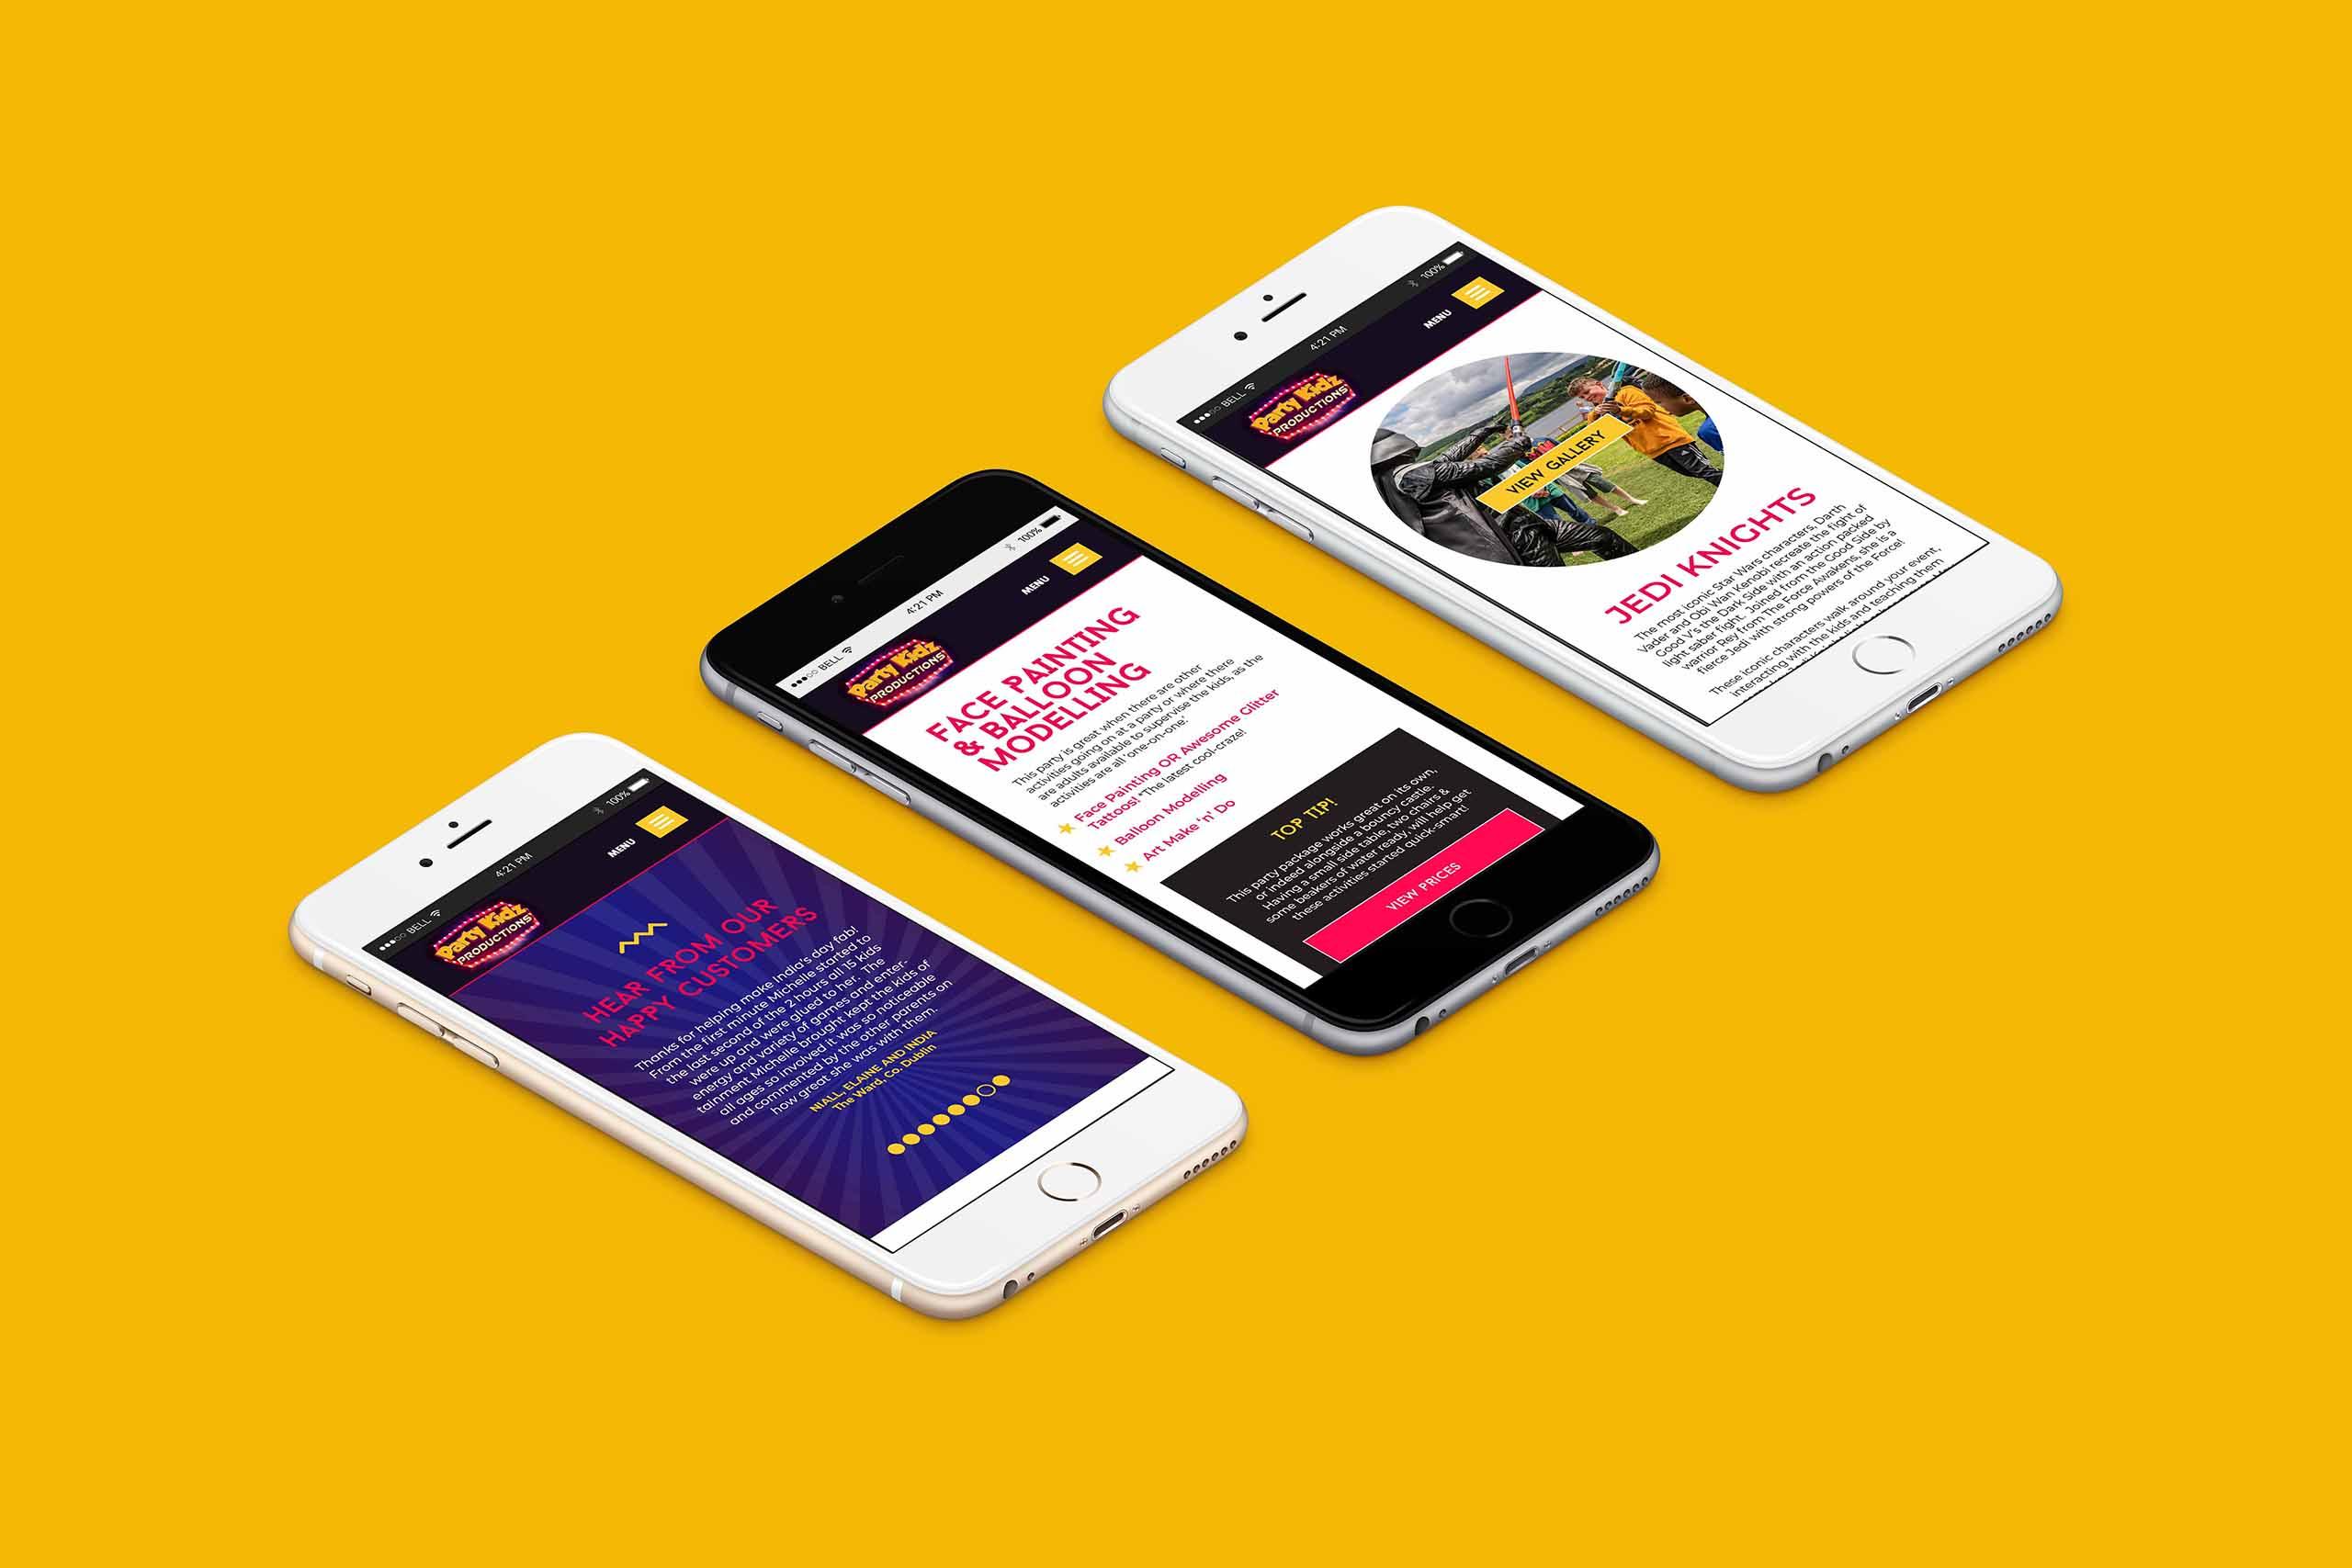 Partykidz Mobile